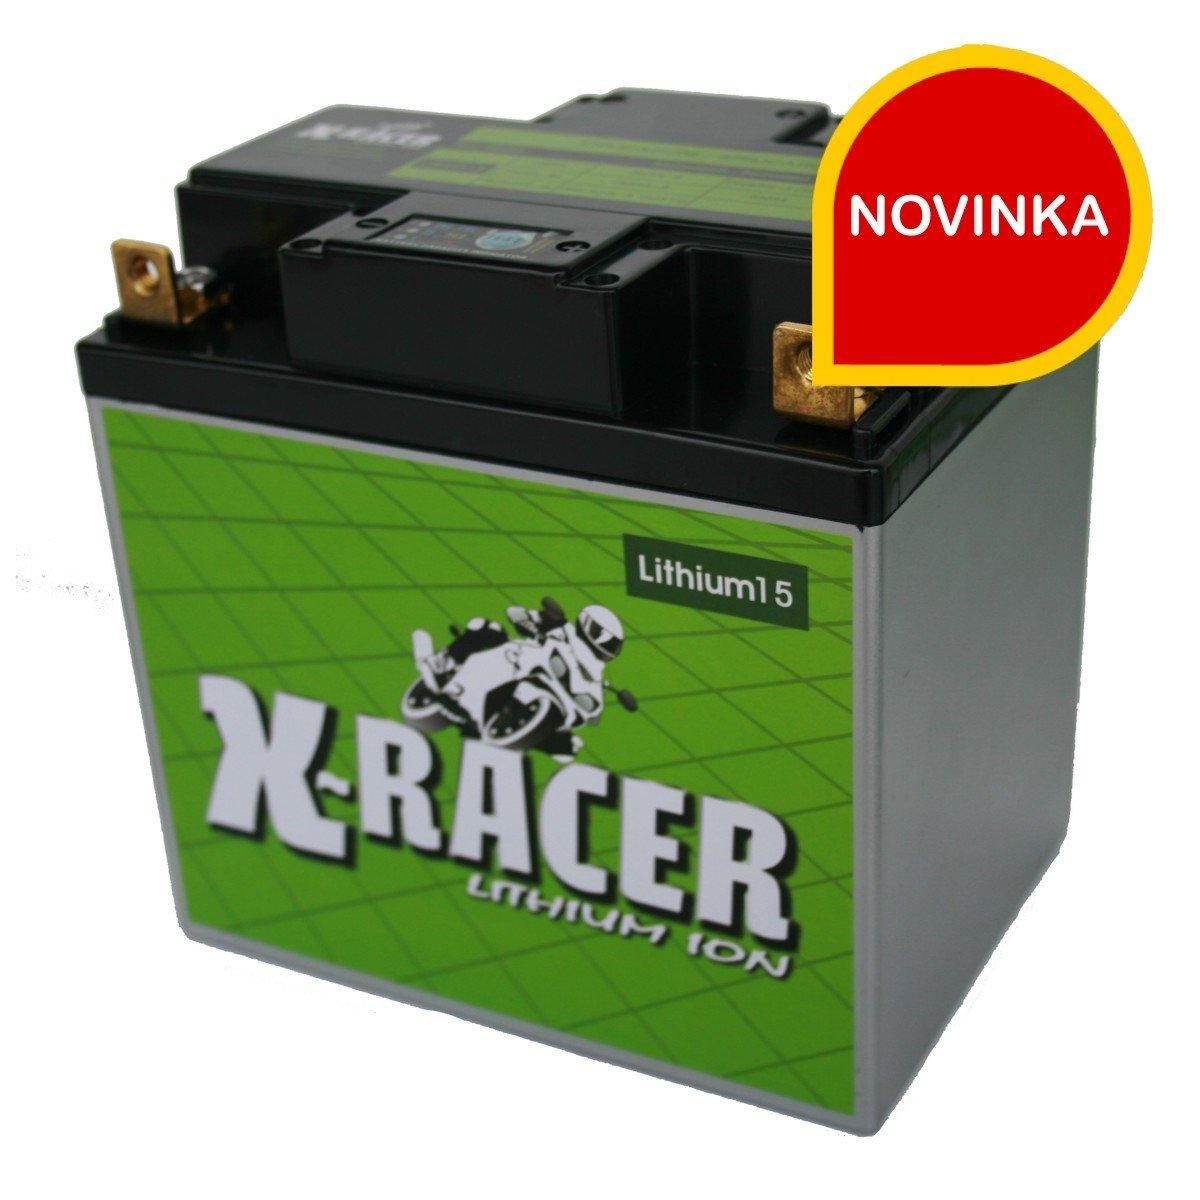 X-RACER Lithium15